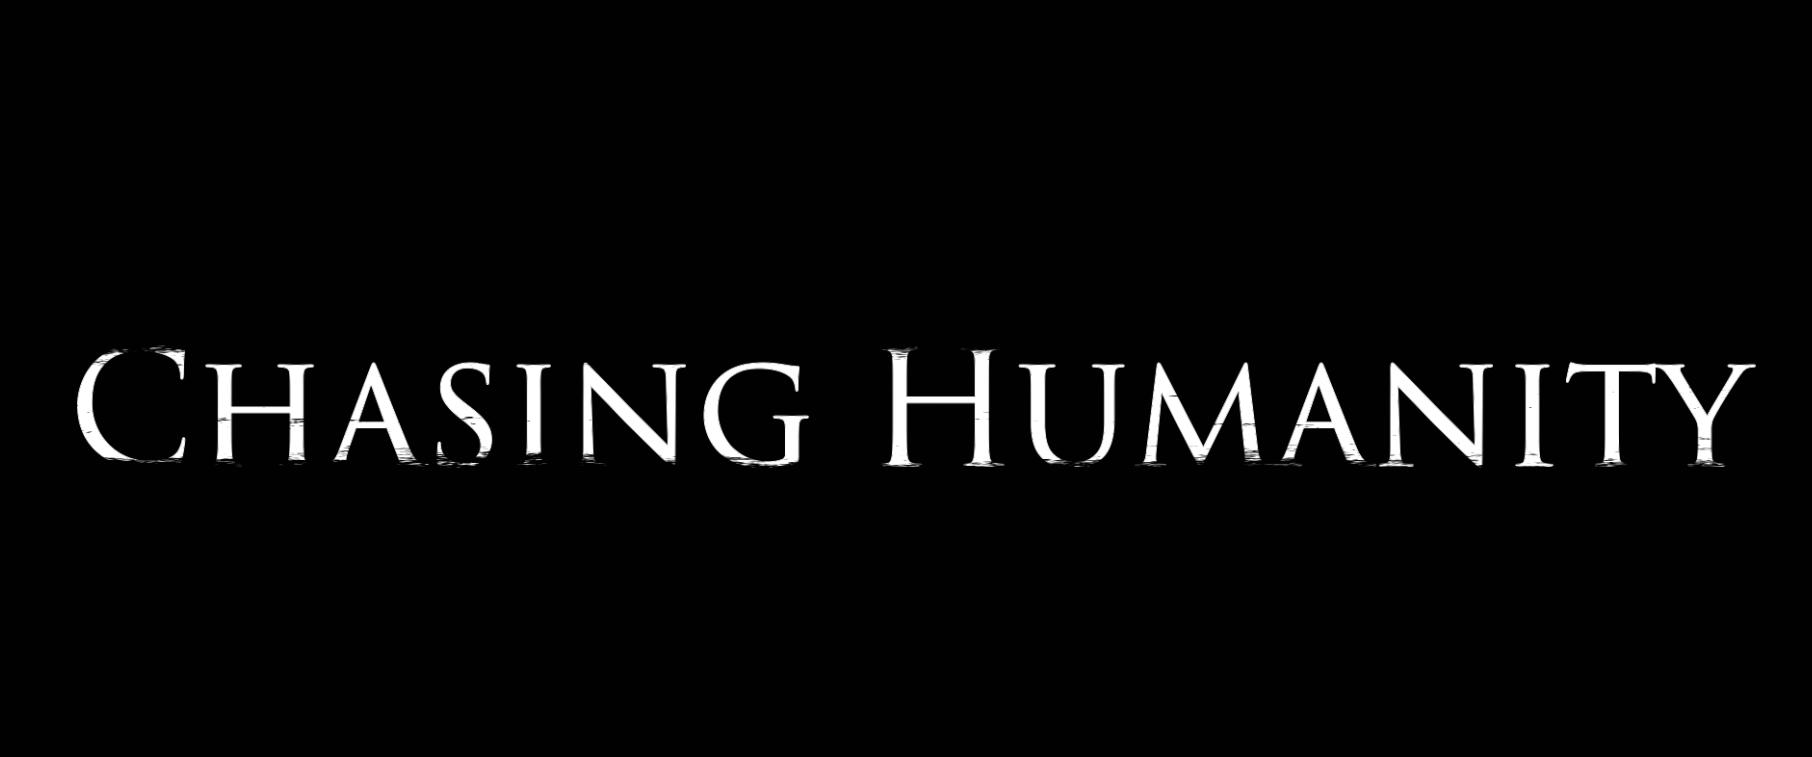 Chasing Humanity